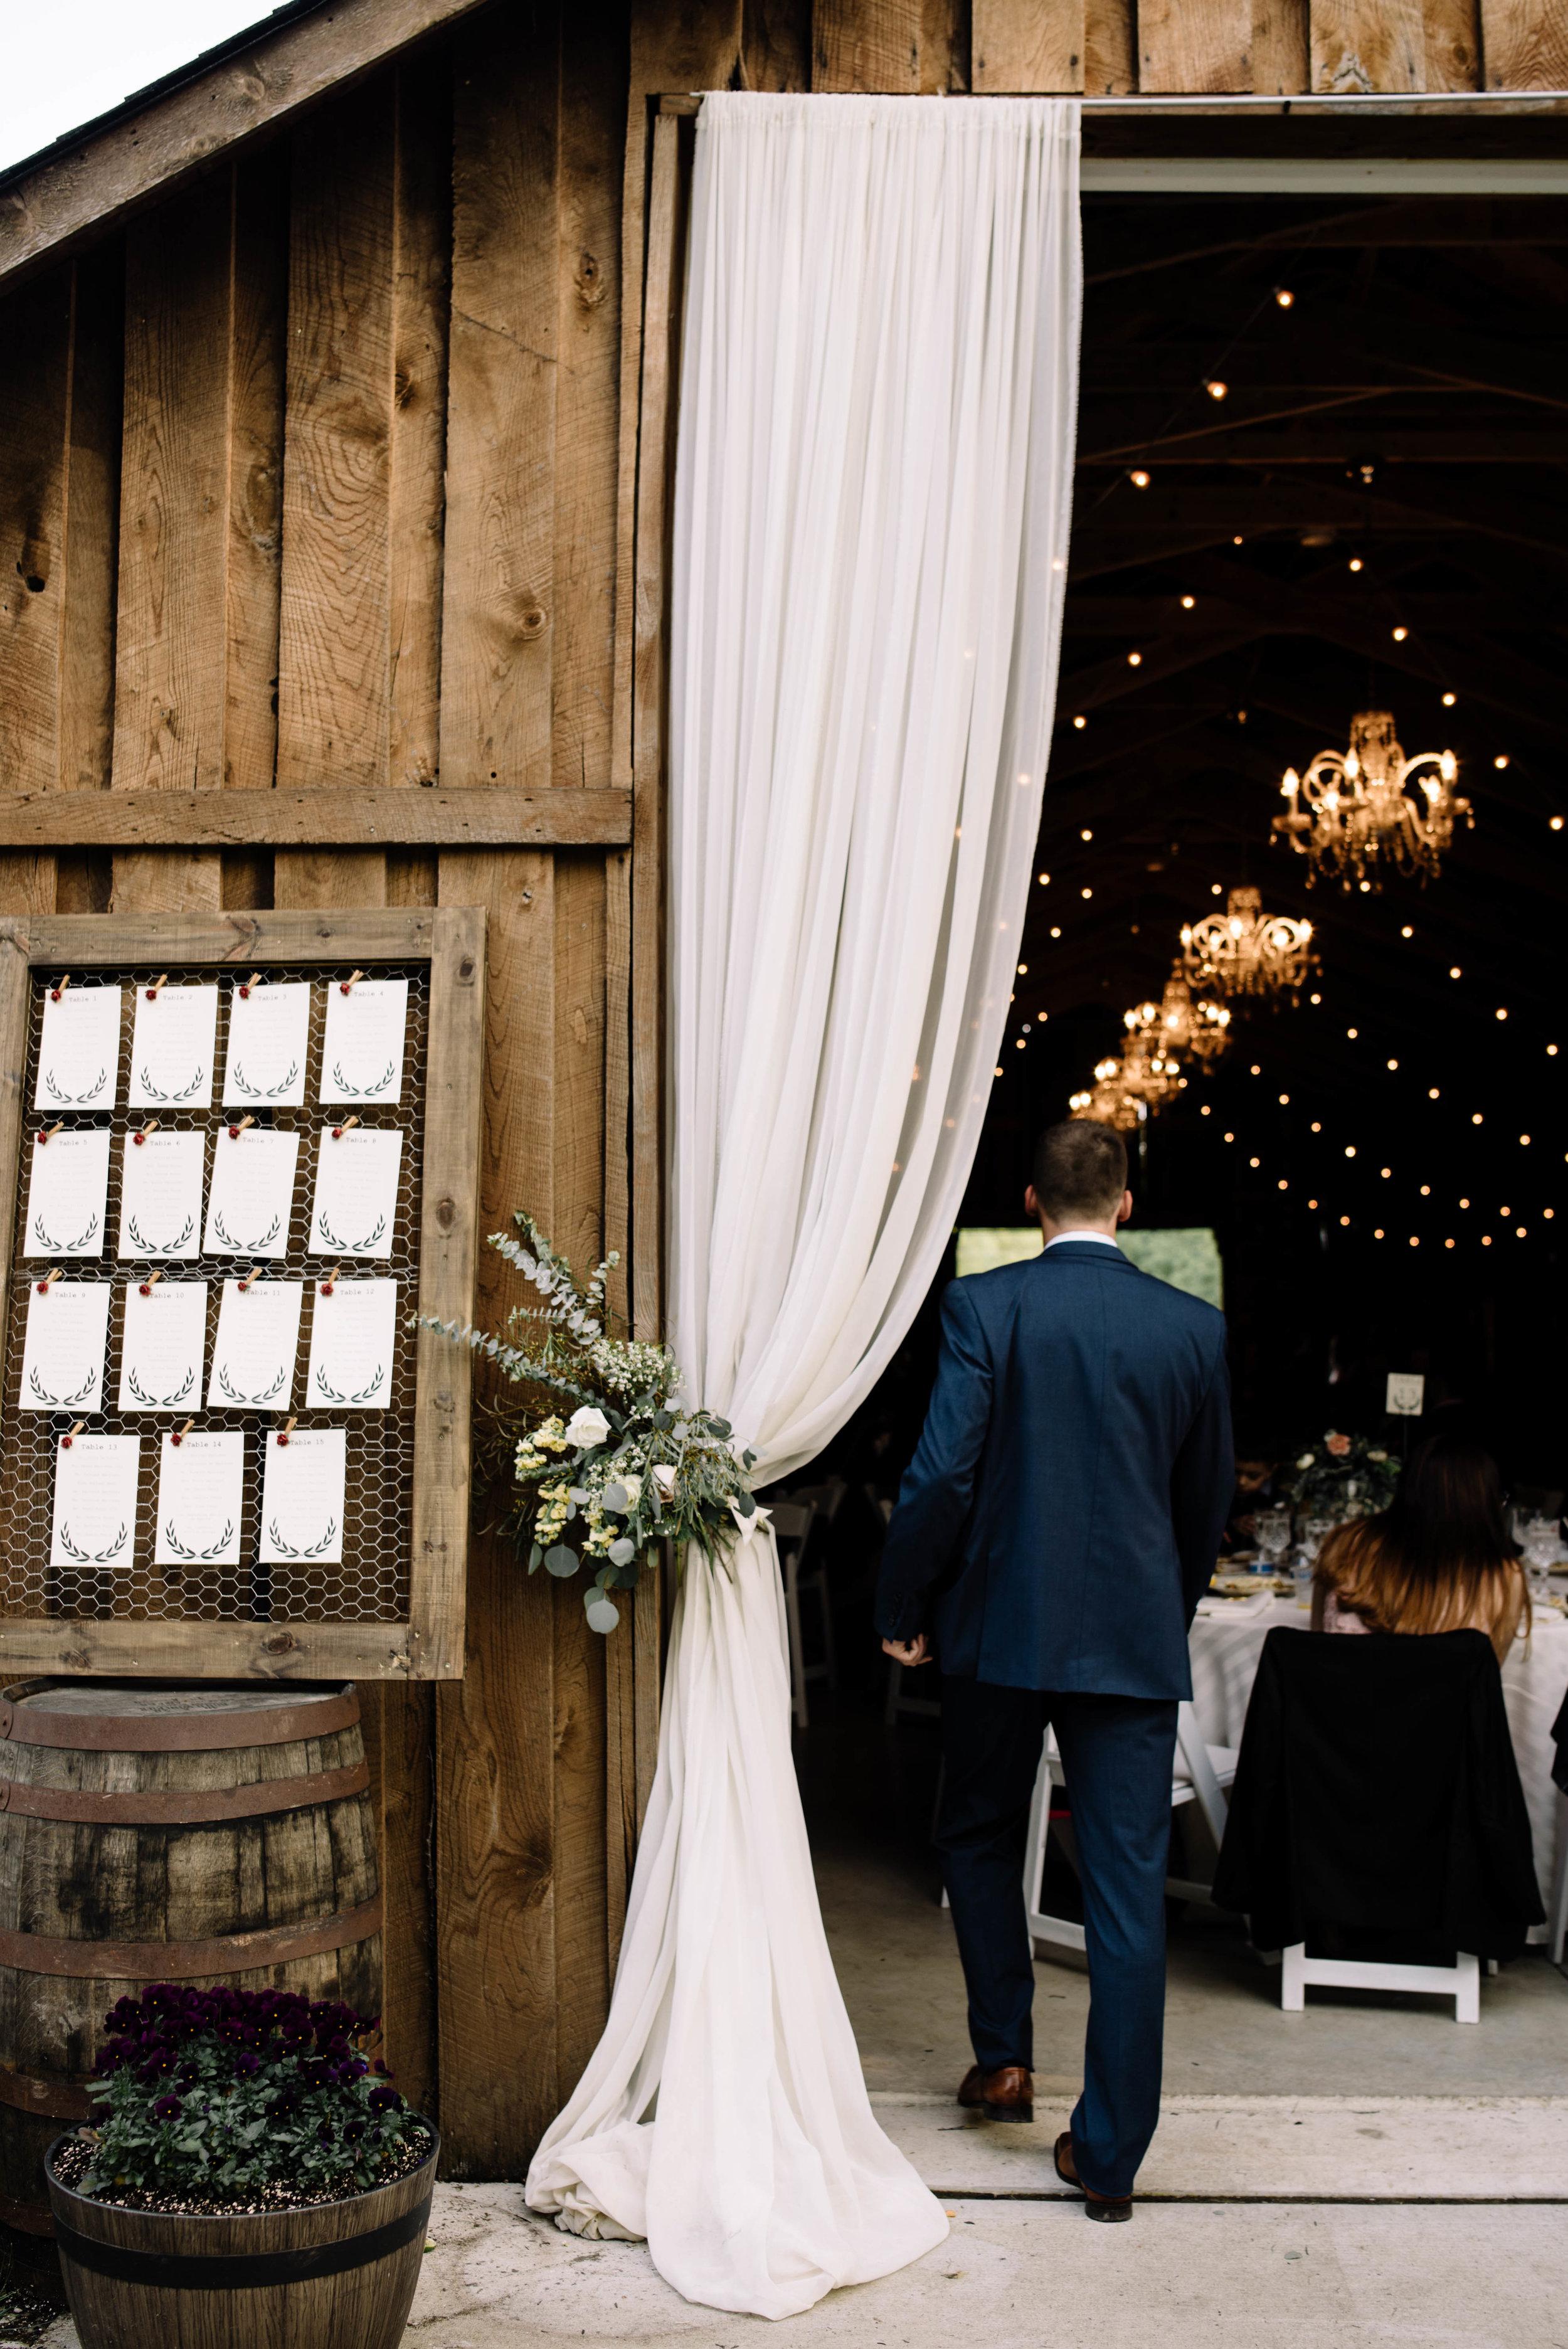 Ana-Dan-Blog-Indianapolis-Wedding-96.jpg